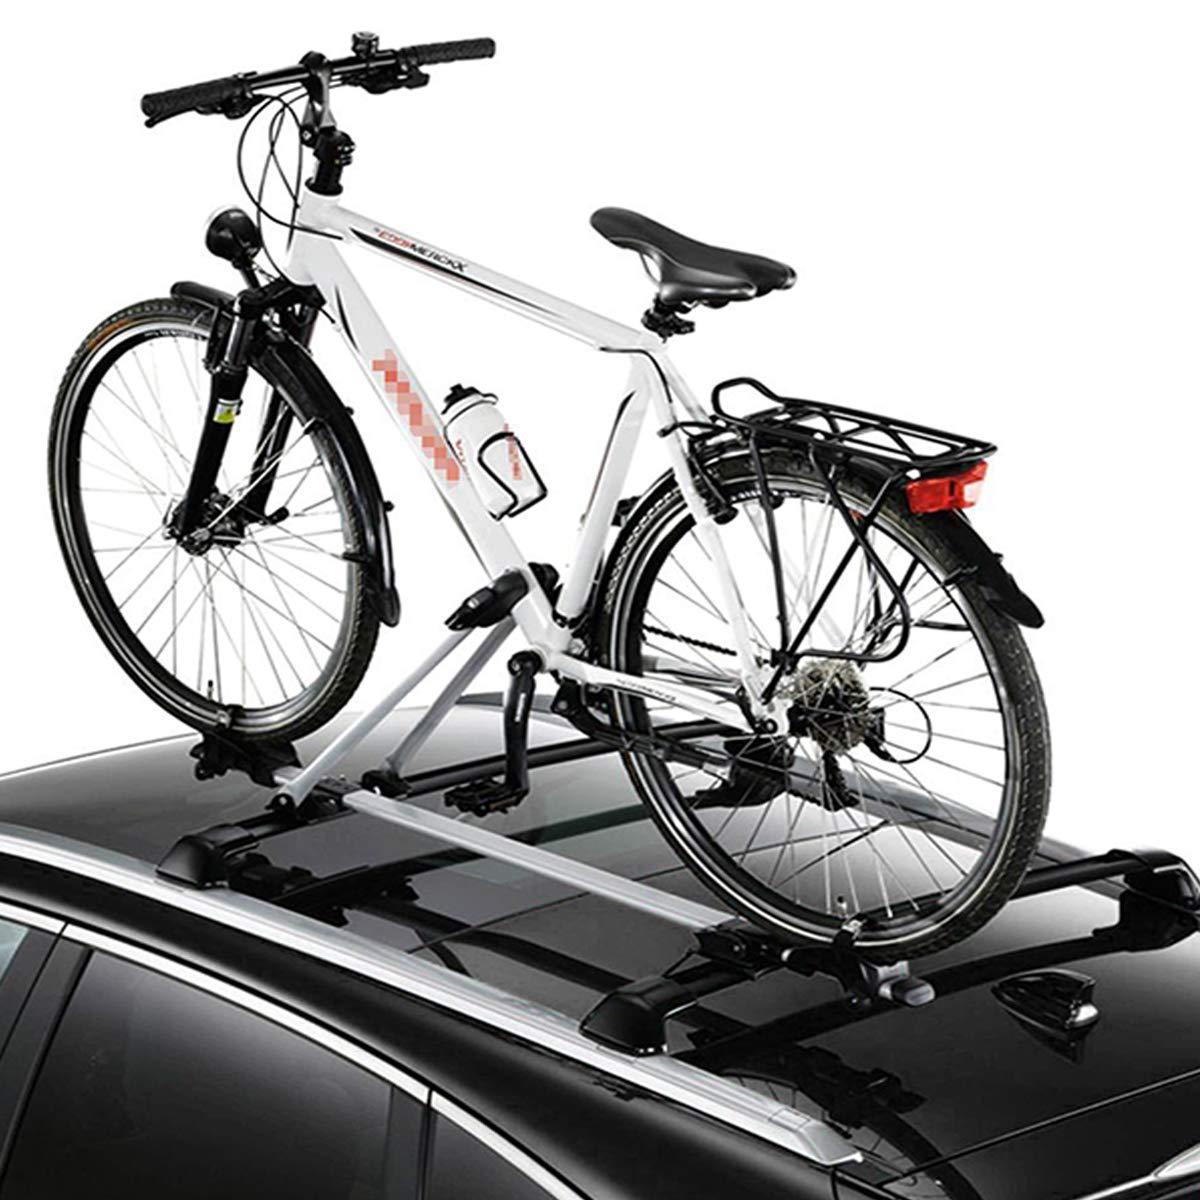 WOLTU 1x Portabicicletas de Techo Soporte 1 Bicicleta con ...